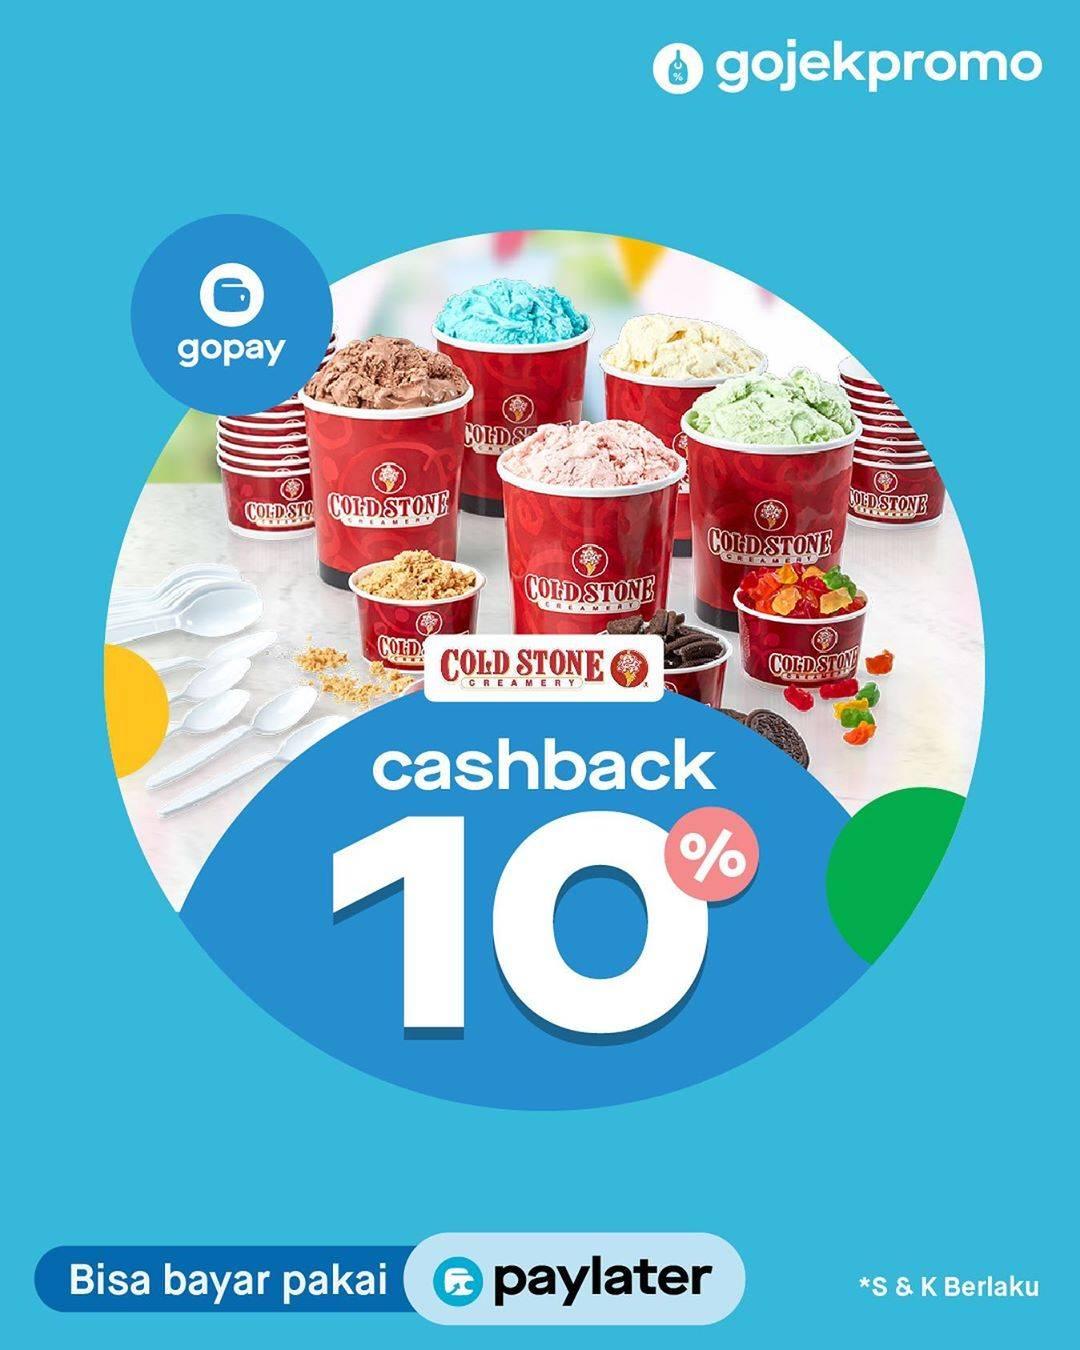 Coldstone Promo Cashback 10% Melalui Gopay